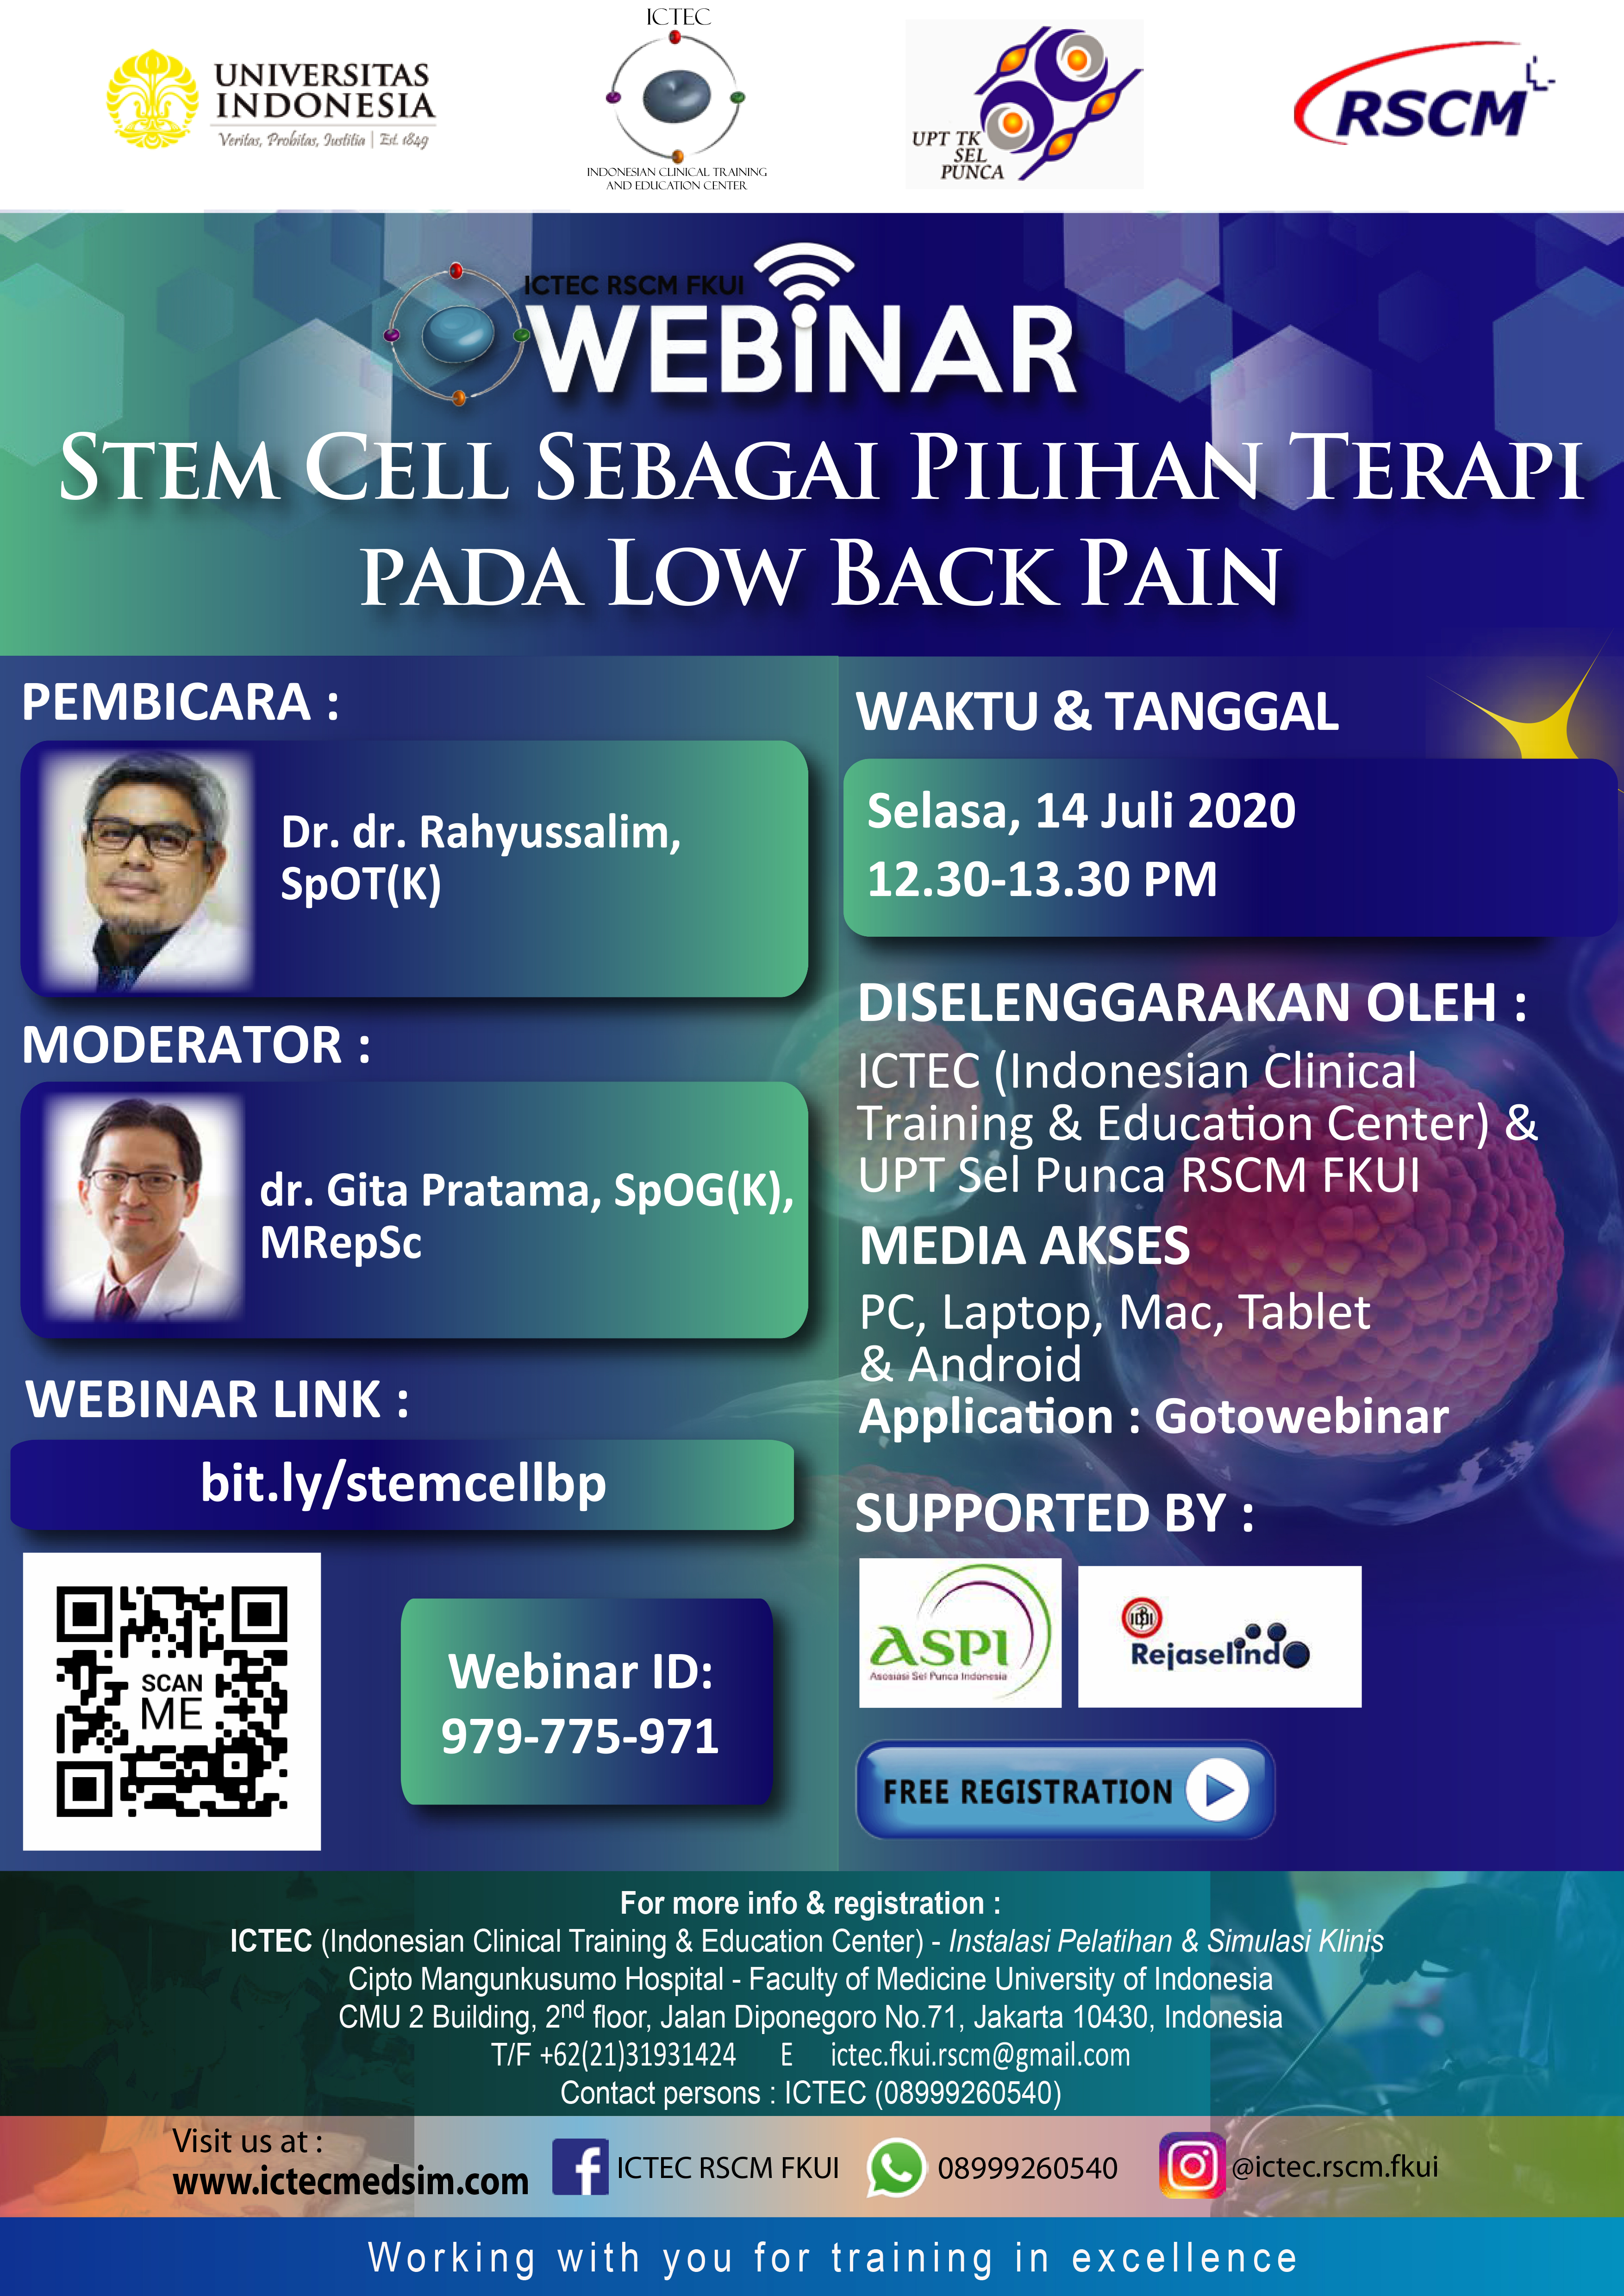 WEBINAR STEM CELLS LBP